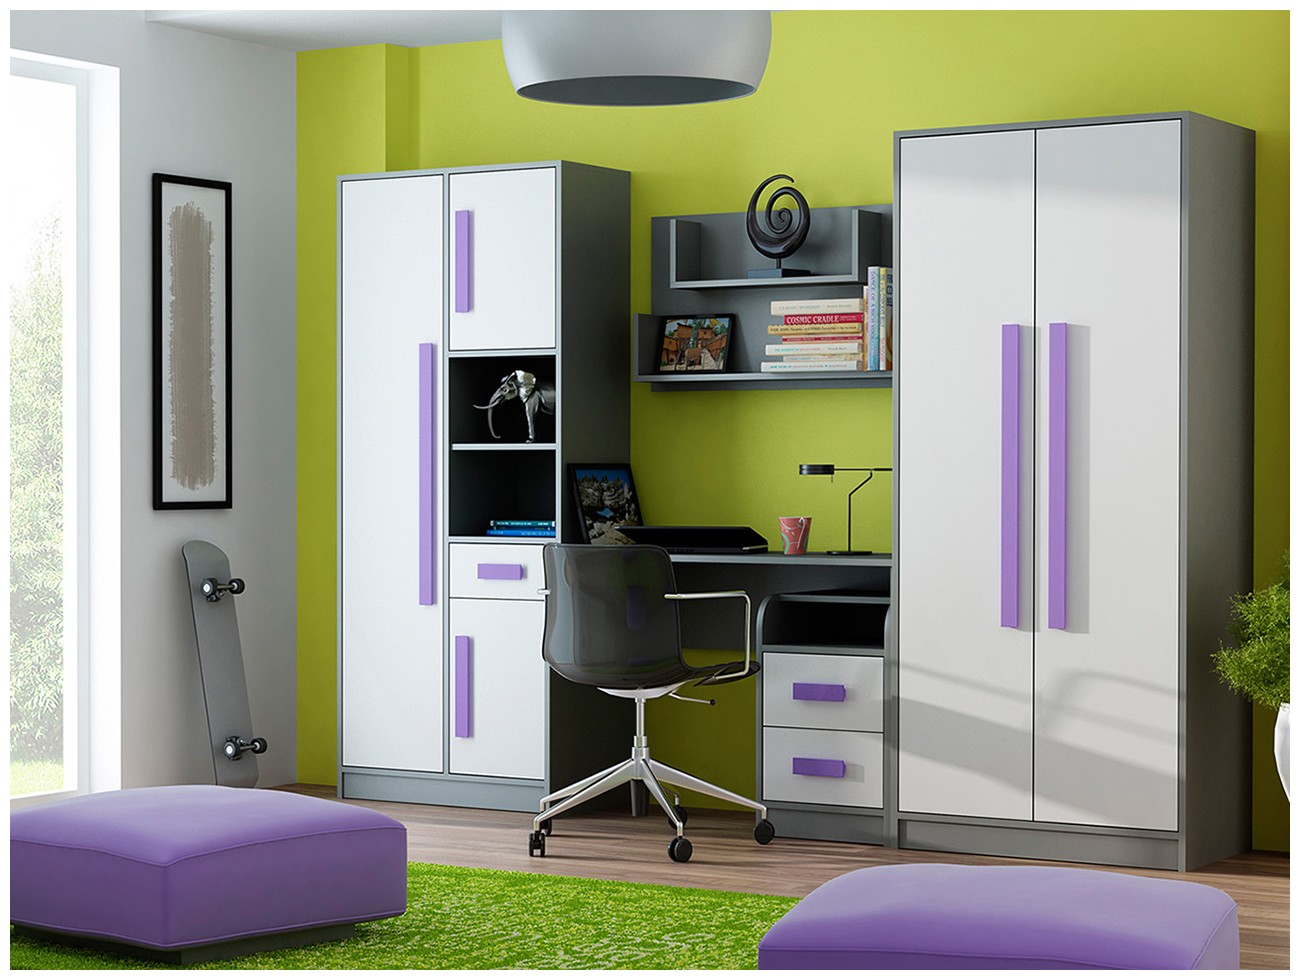 Domel Dětský pokoj GIT 4 Domel Barva: antracit-bila-zelena